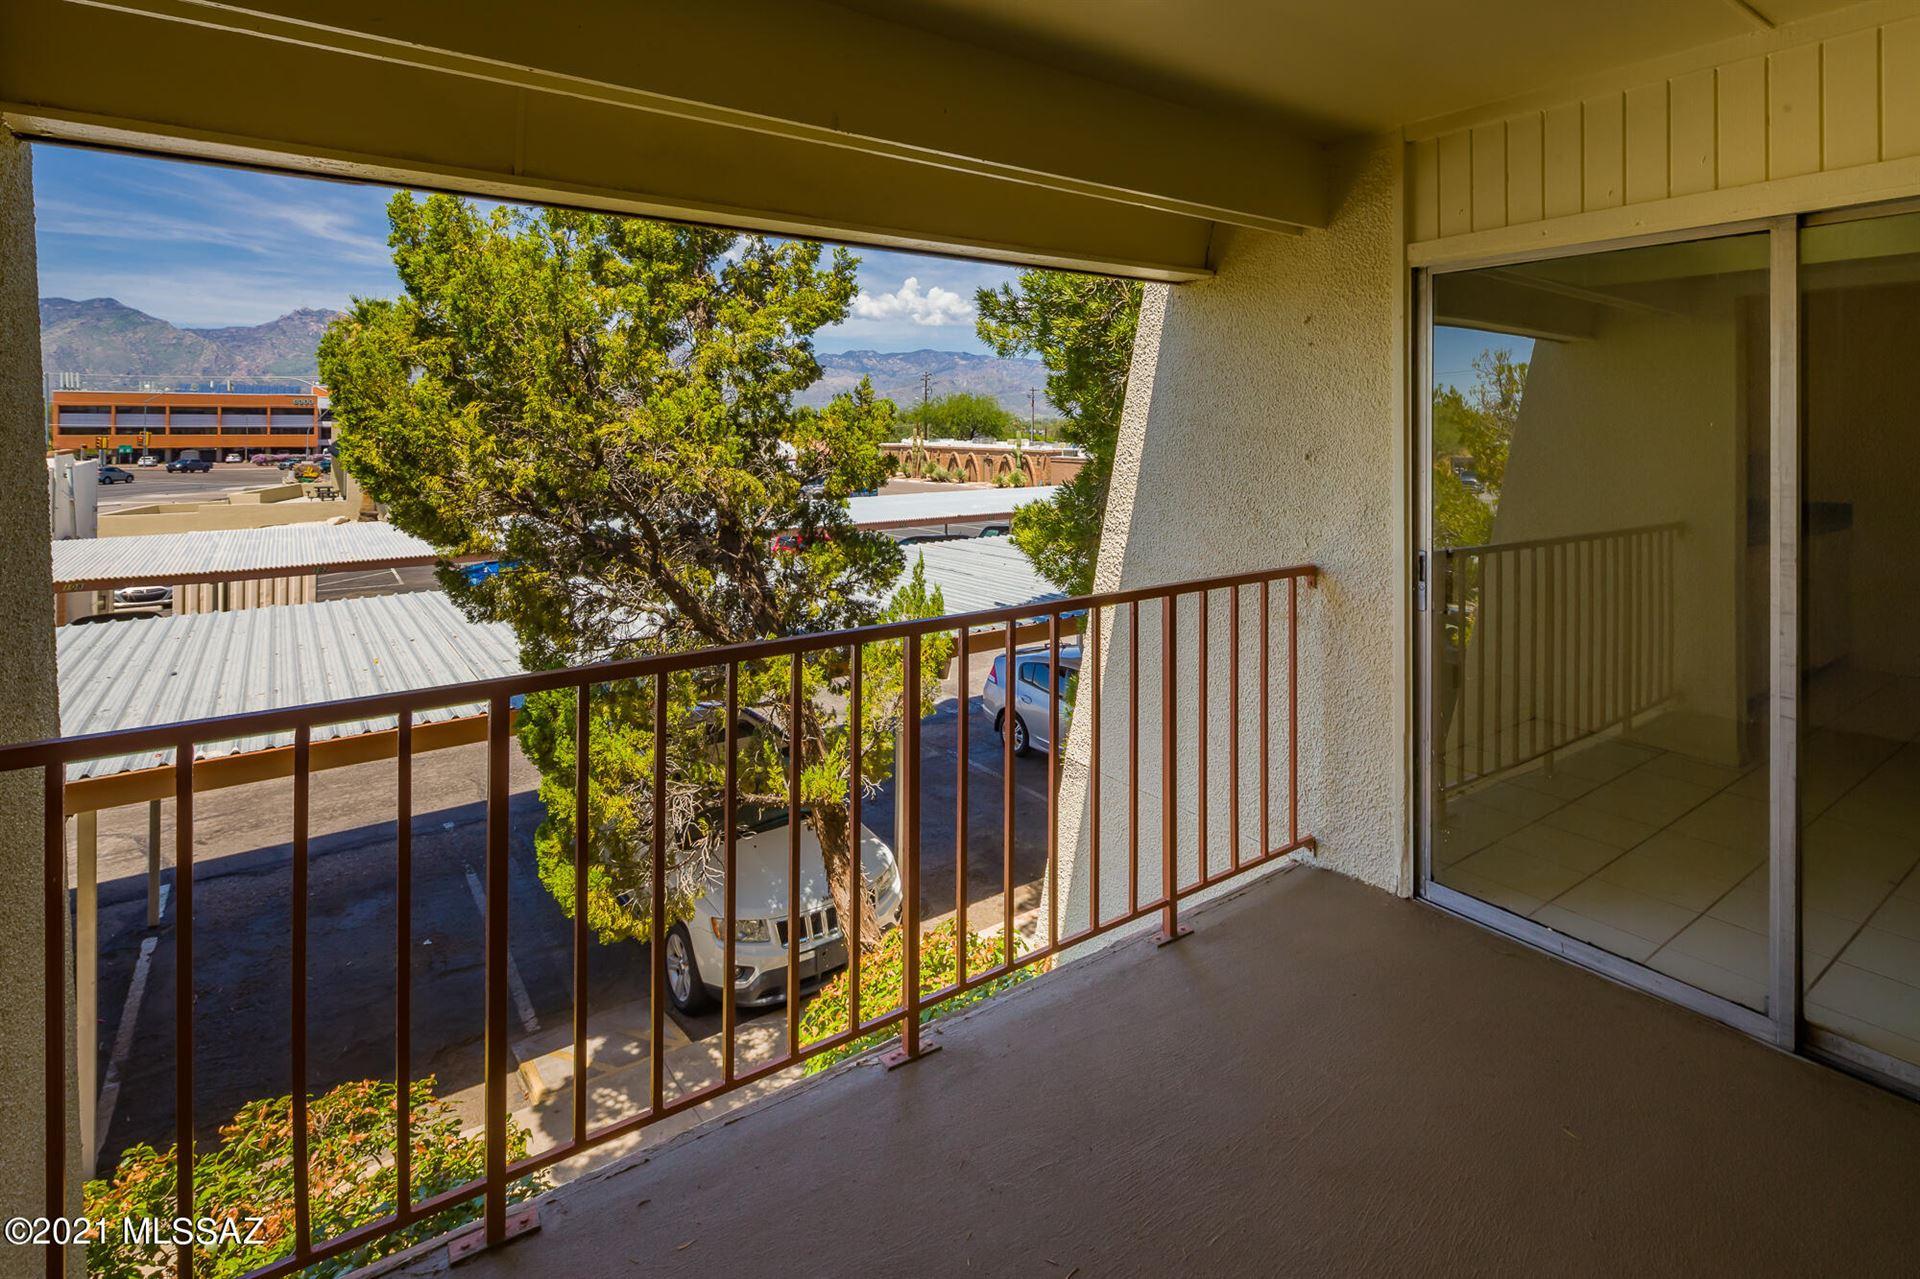 1600 N Wilmot Road #200, Tucson, AZ 85712 - MLS#: 22119606